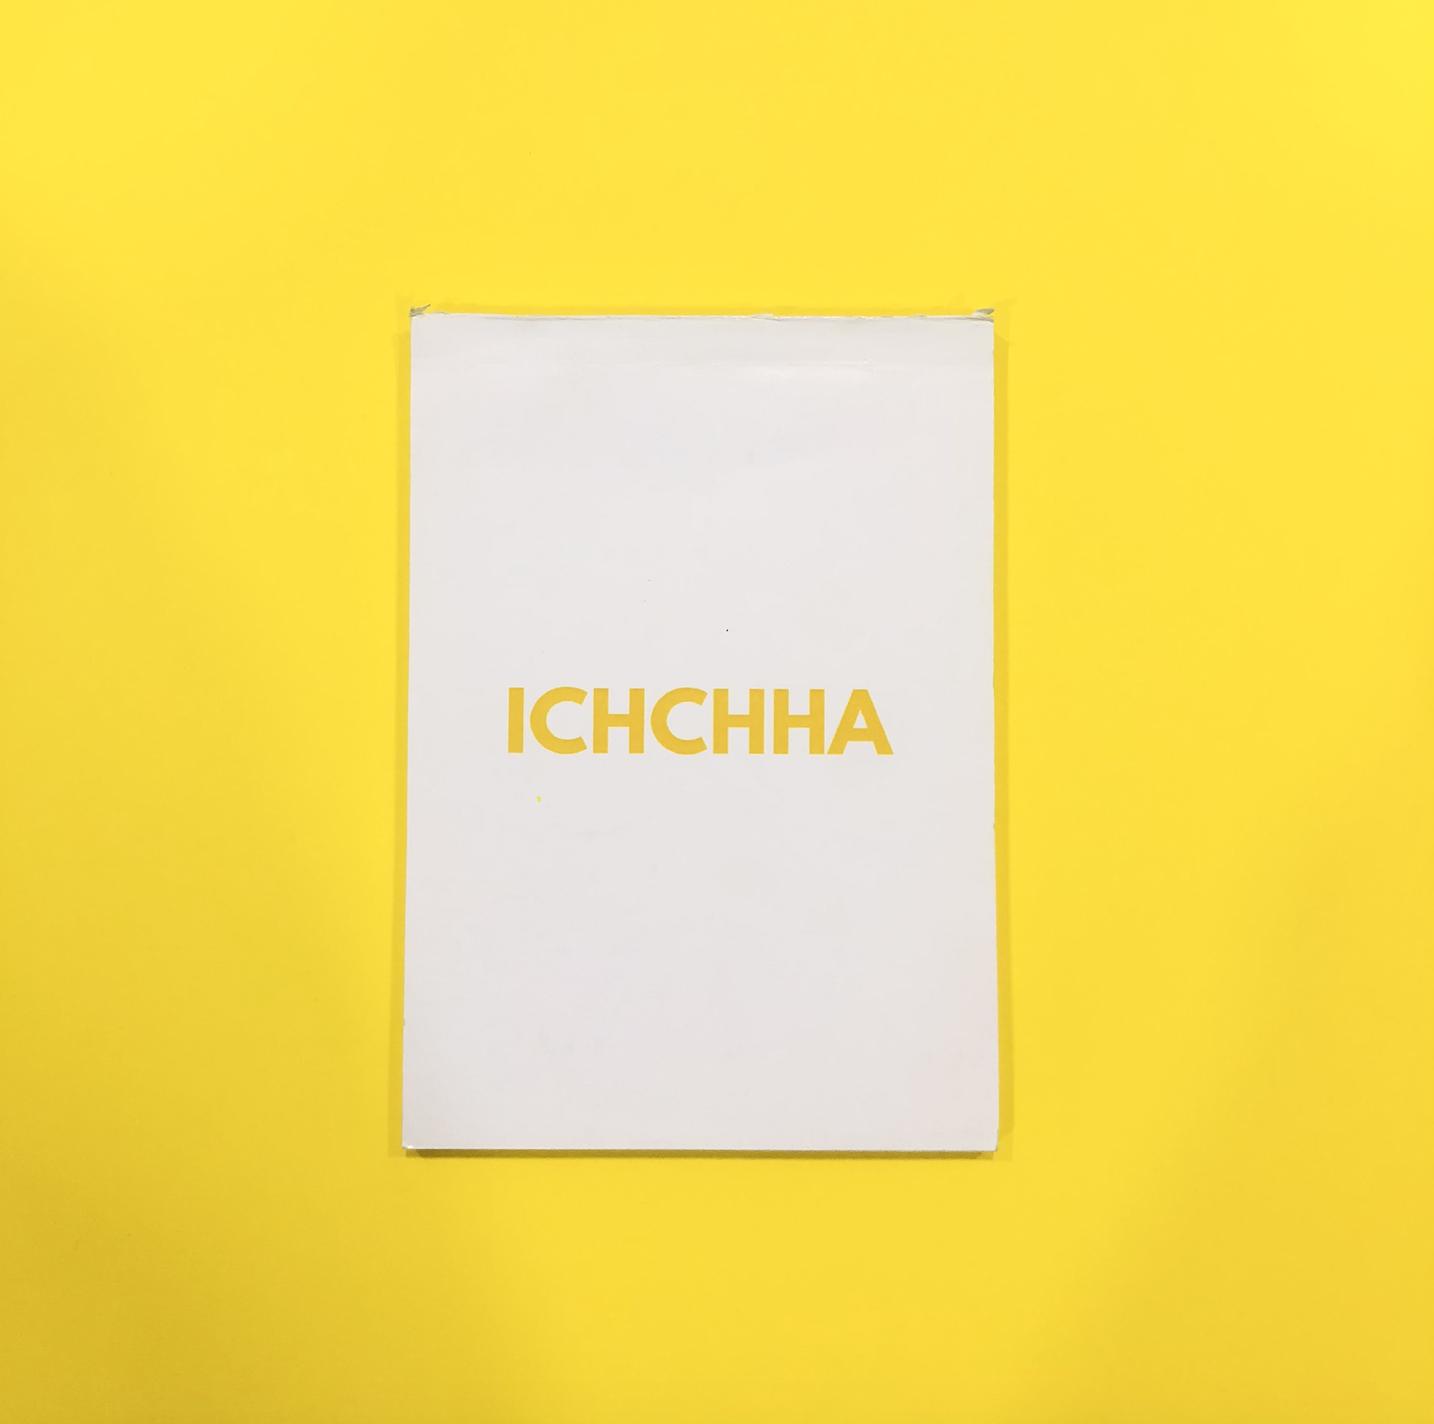 Ichchha Notepad (Plain White)